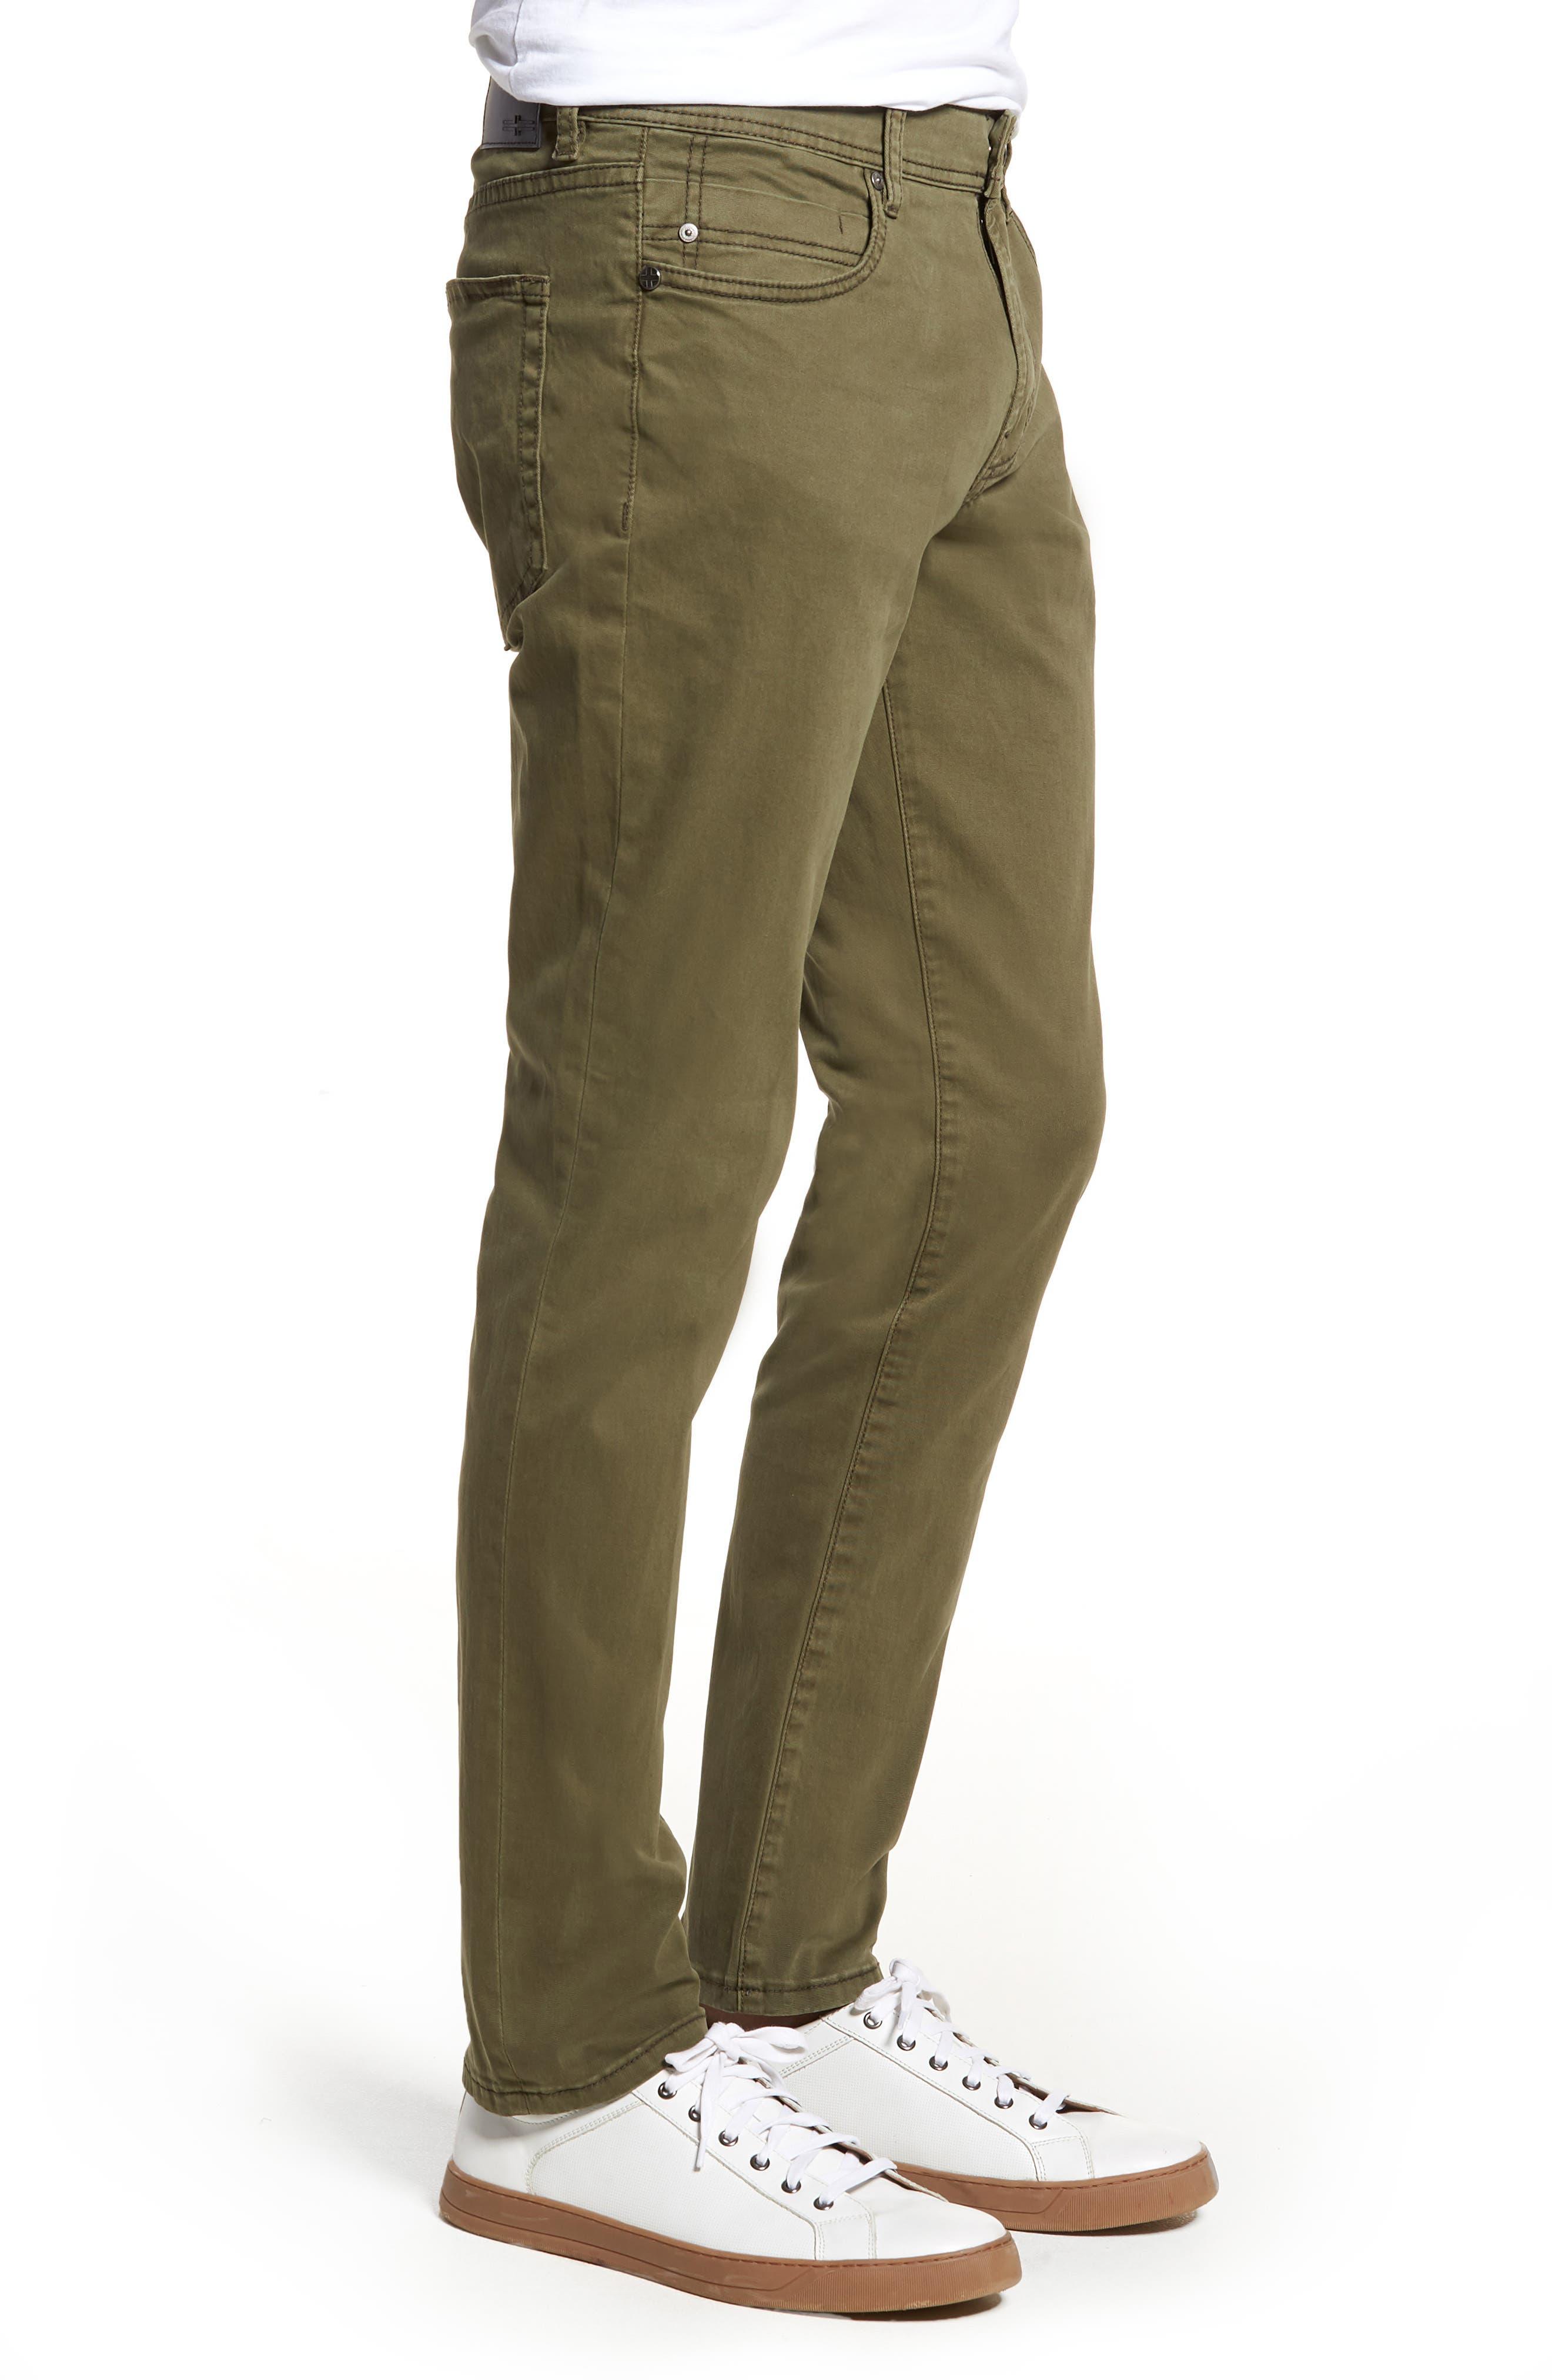 Jeans Co. Kingston Slim Straight Leg Jeans,                             Alternate thumbnail 3, color,                             OLIVE NIGHT